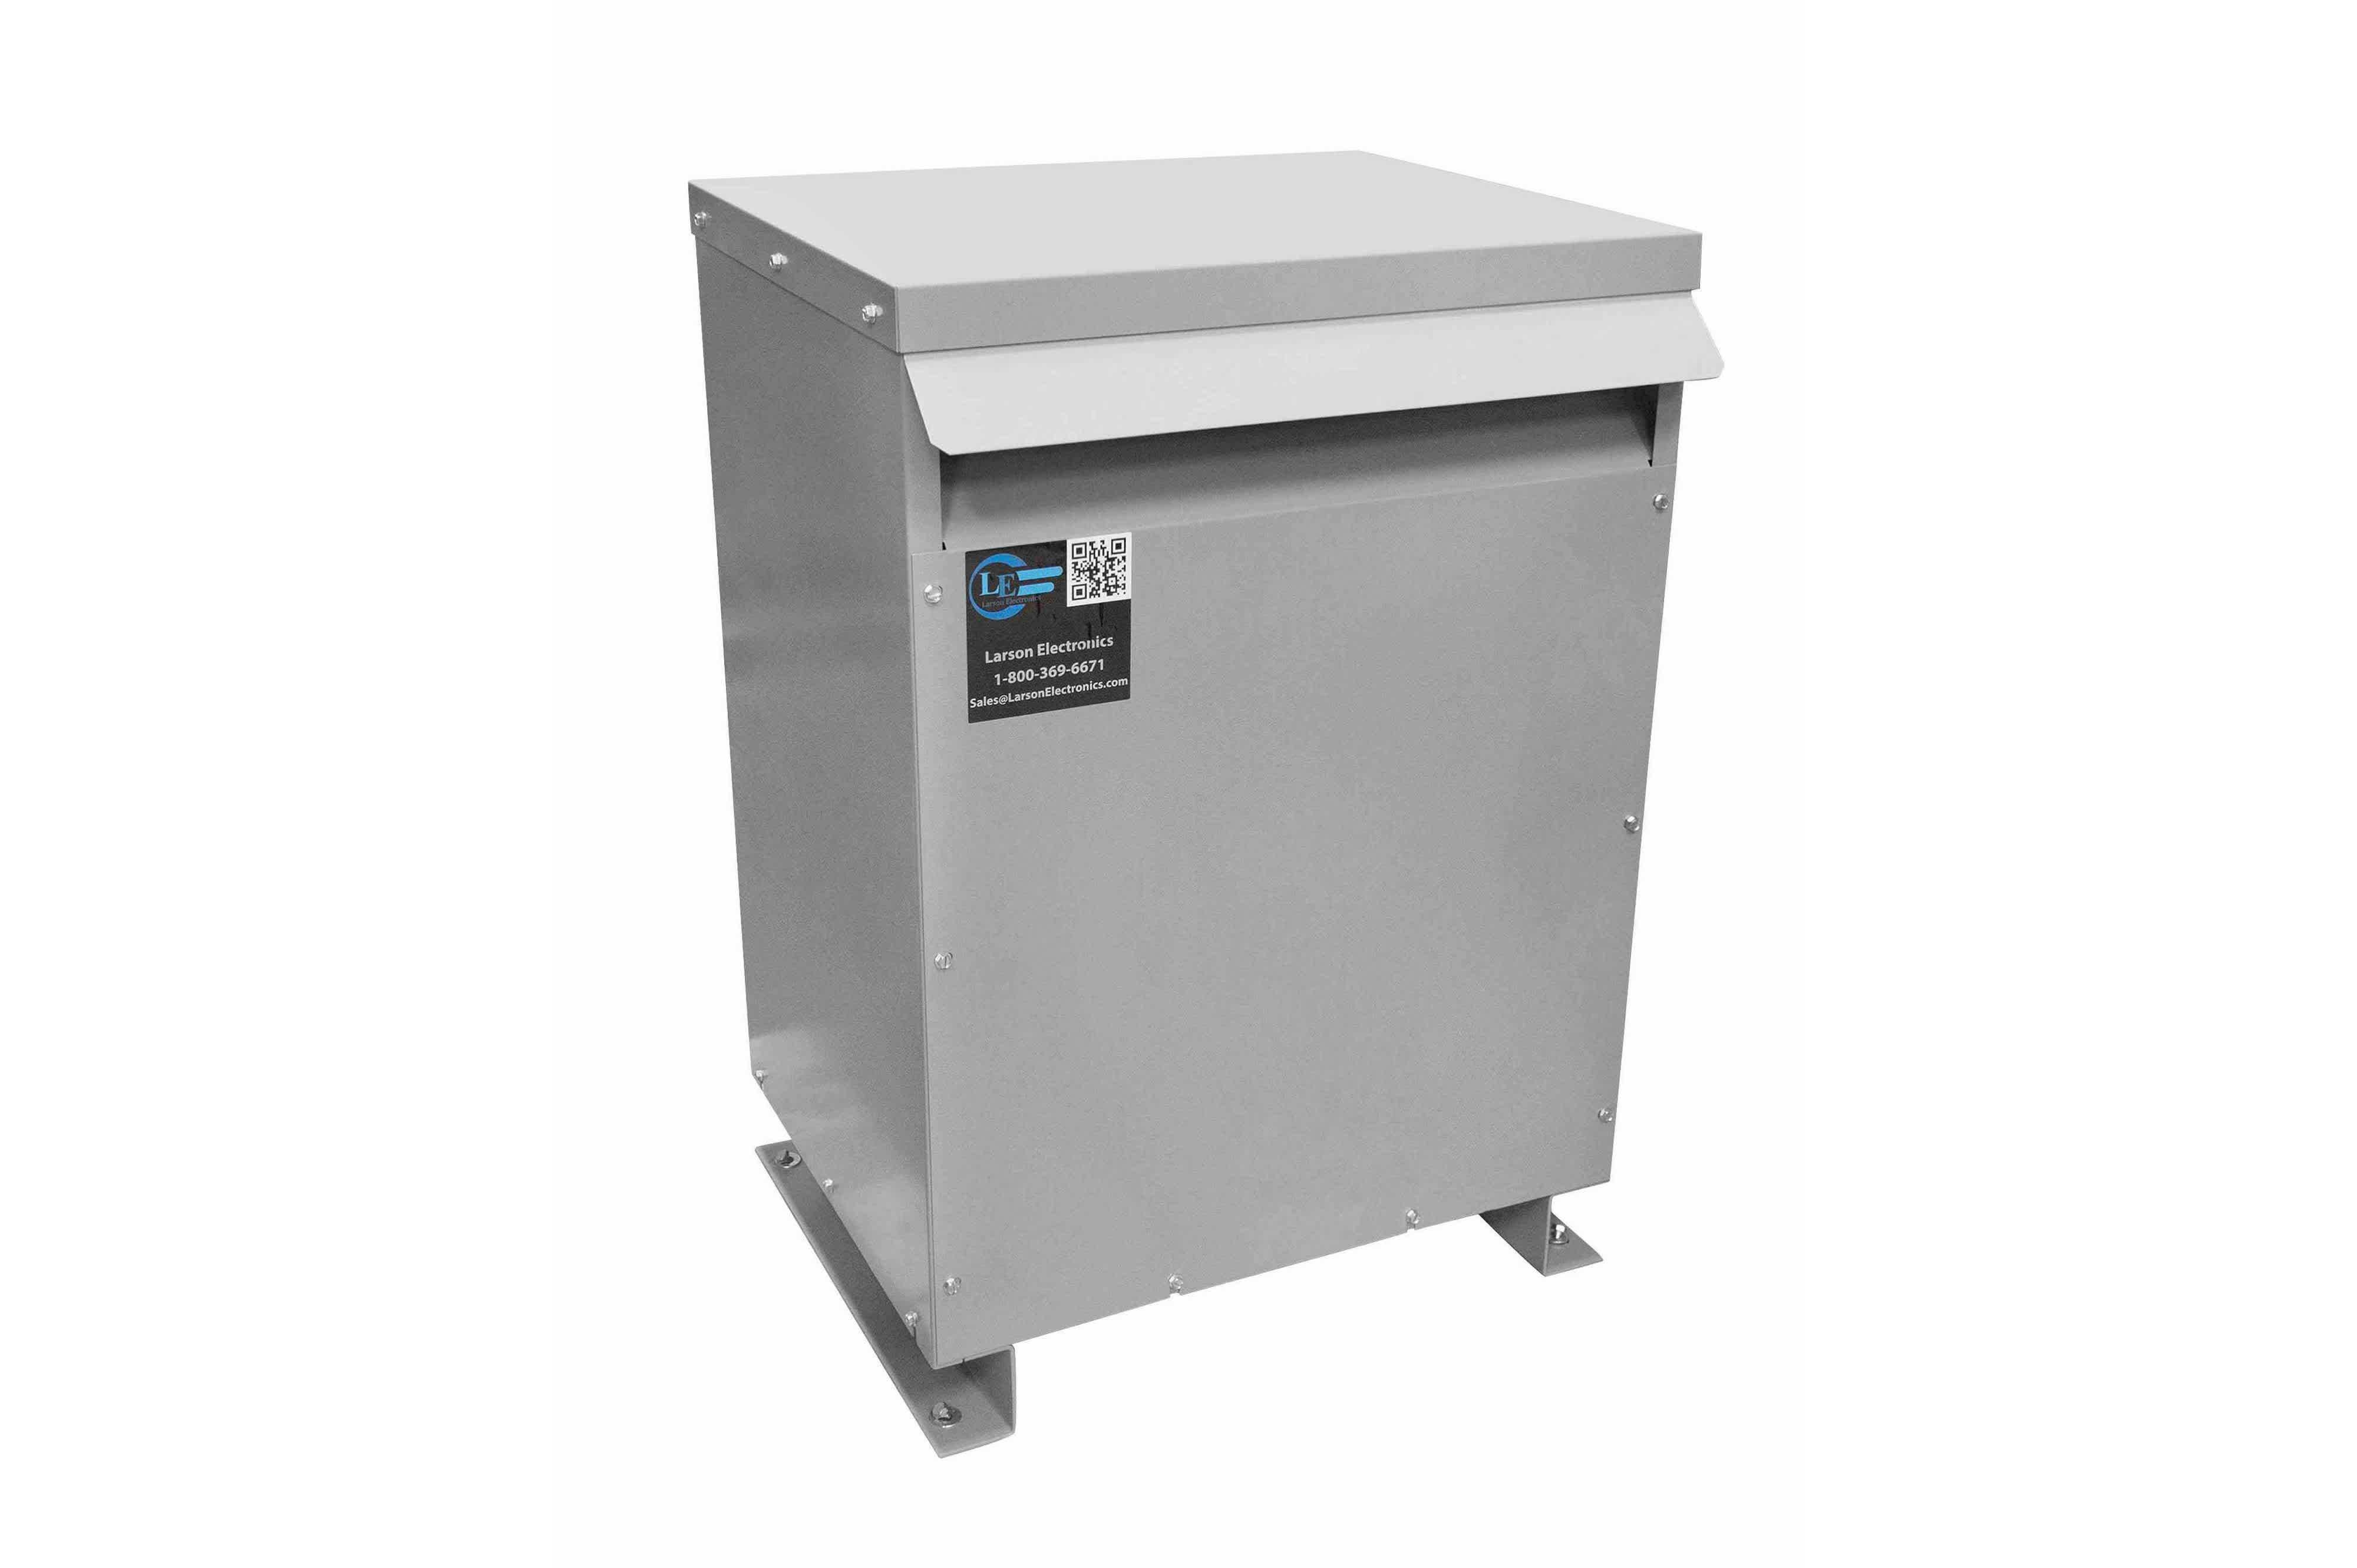 37.5 kVA 3PH Isolation Transformer, 480V Wye Primary, 415Y/240 Wye-N Secondary, N3R, Ventilated, 60 Hz